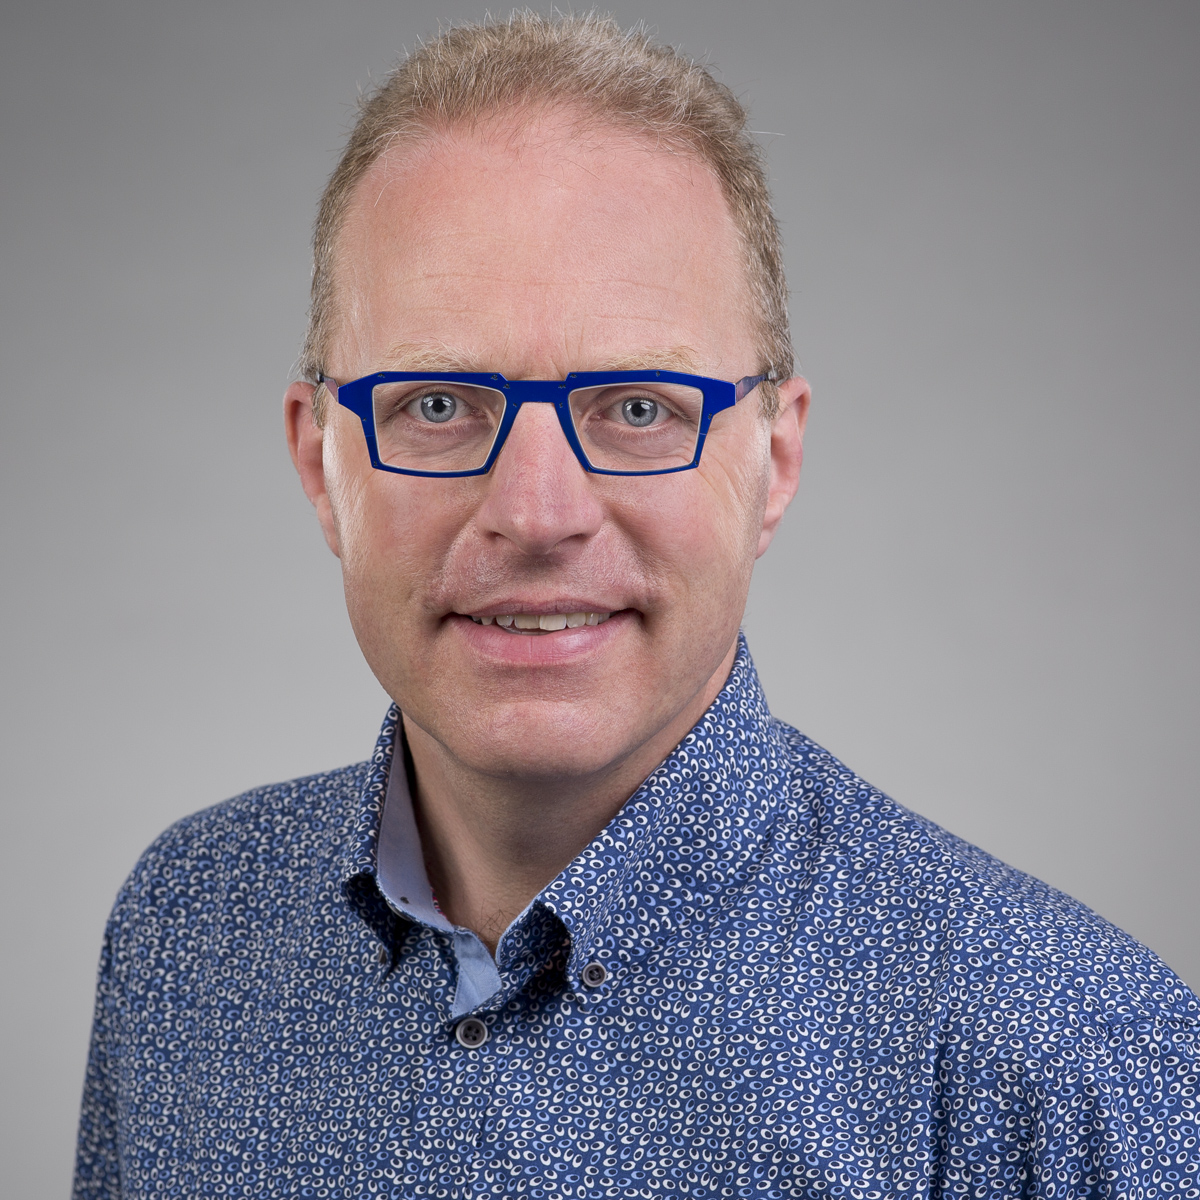 Willem Kemmers